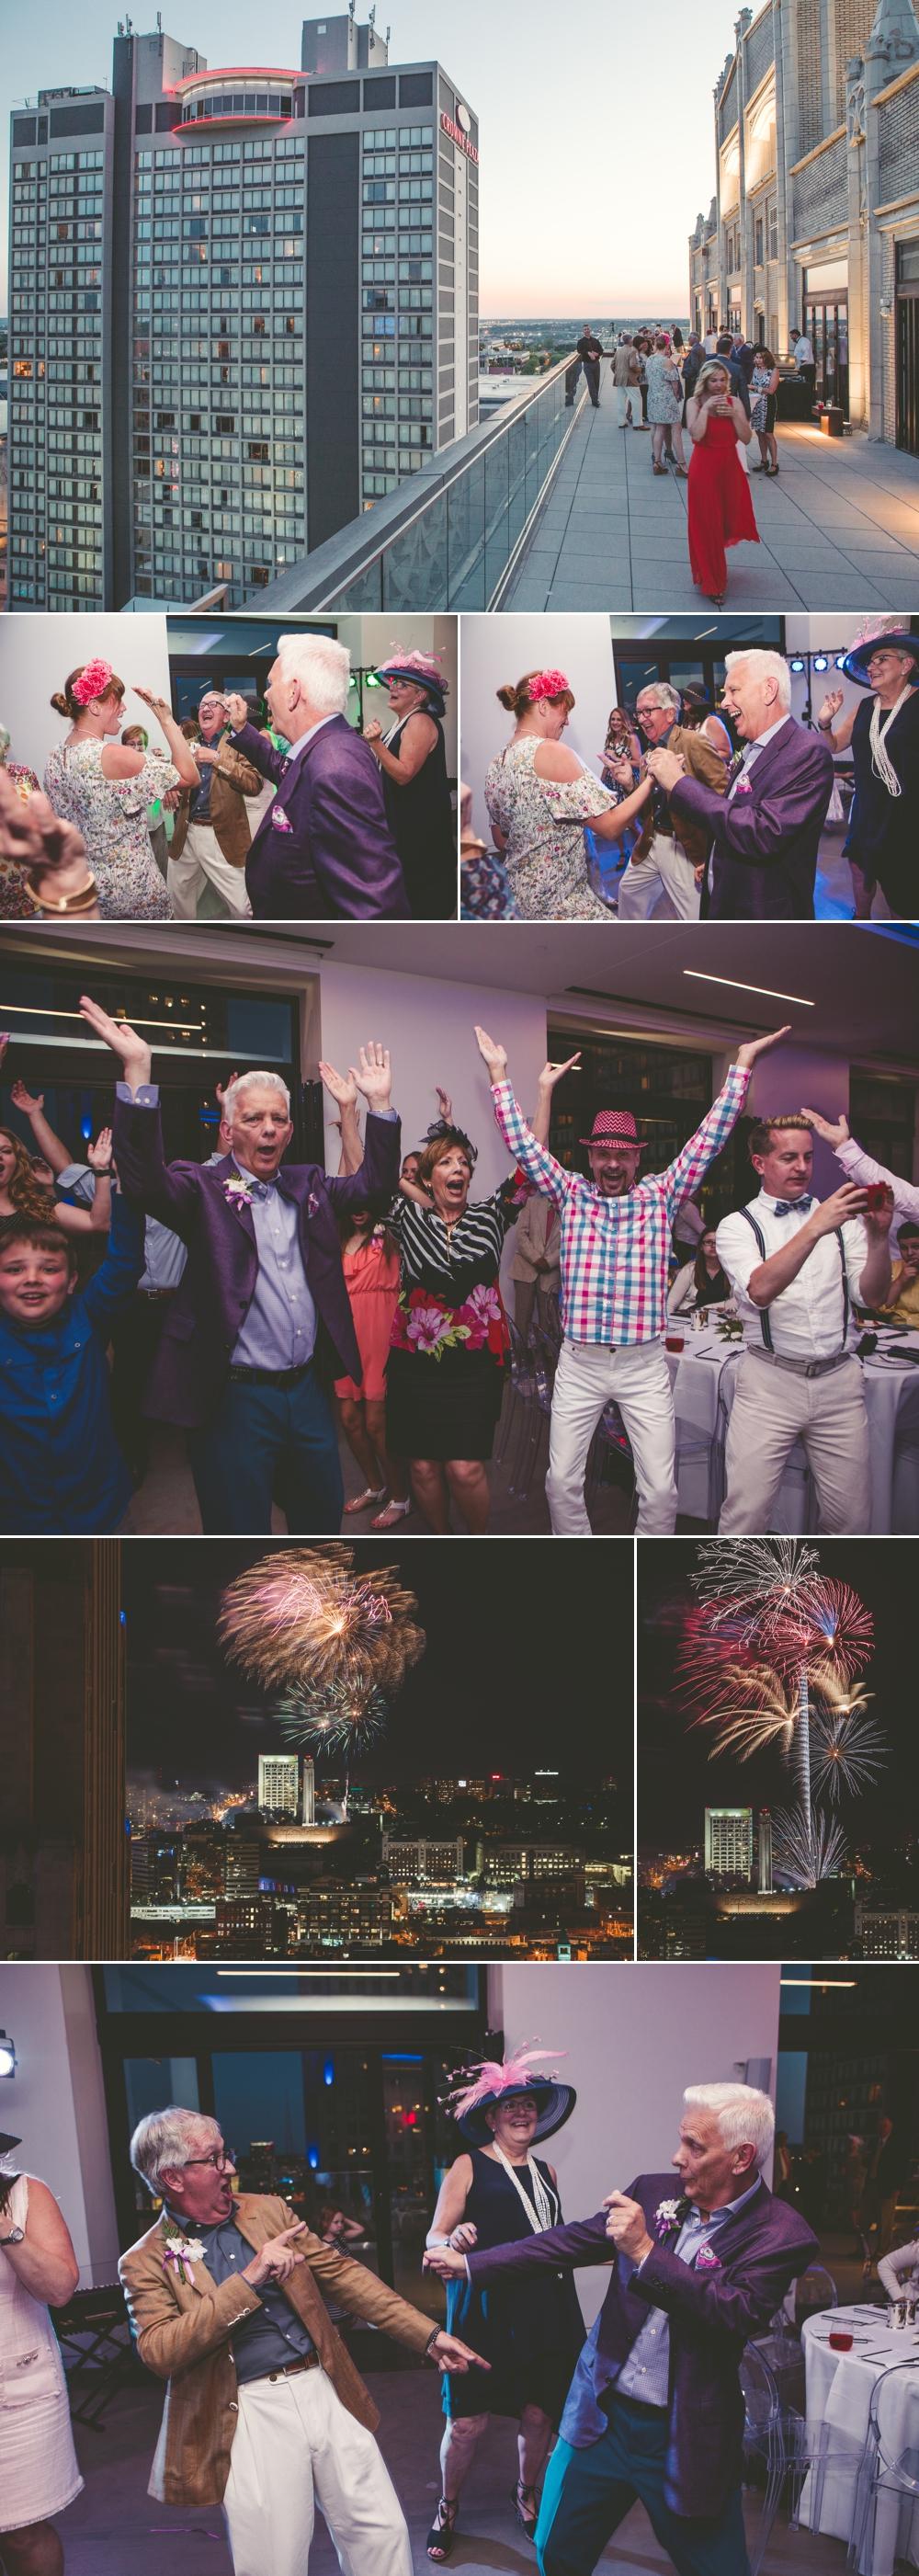 jason_domingues_photography_best_kansas_city_photographer_kc_weddings_same_sex_wedding_brass_on_baltimore_love_wins0003